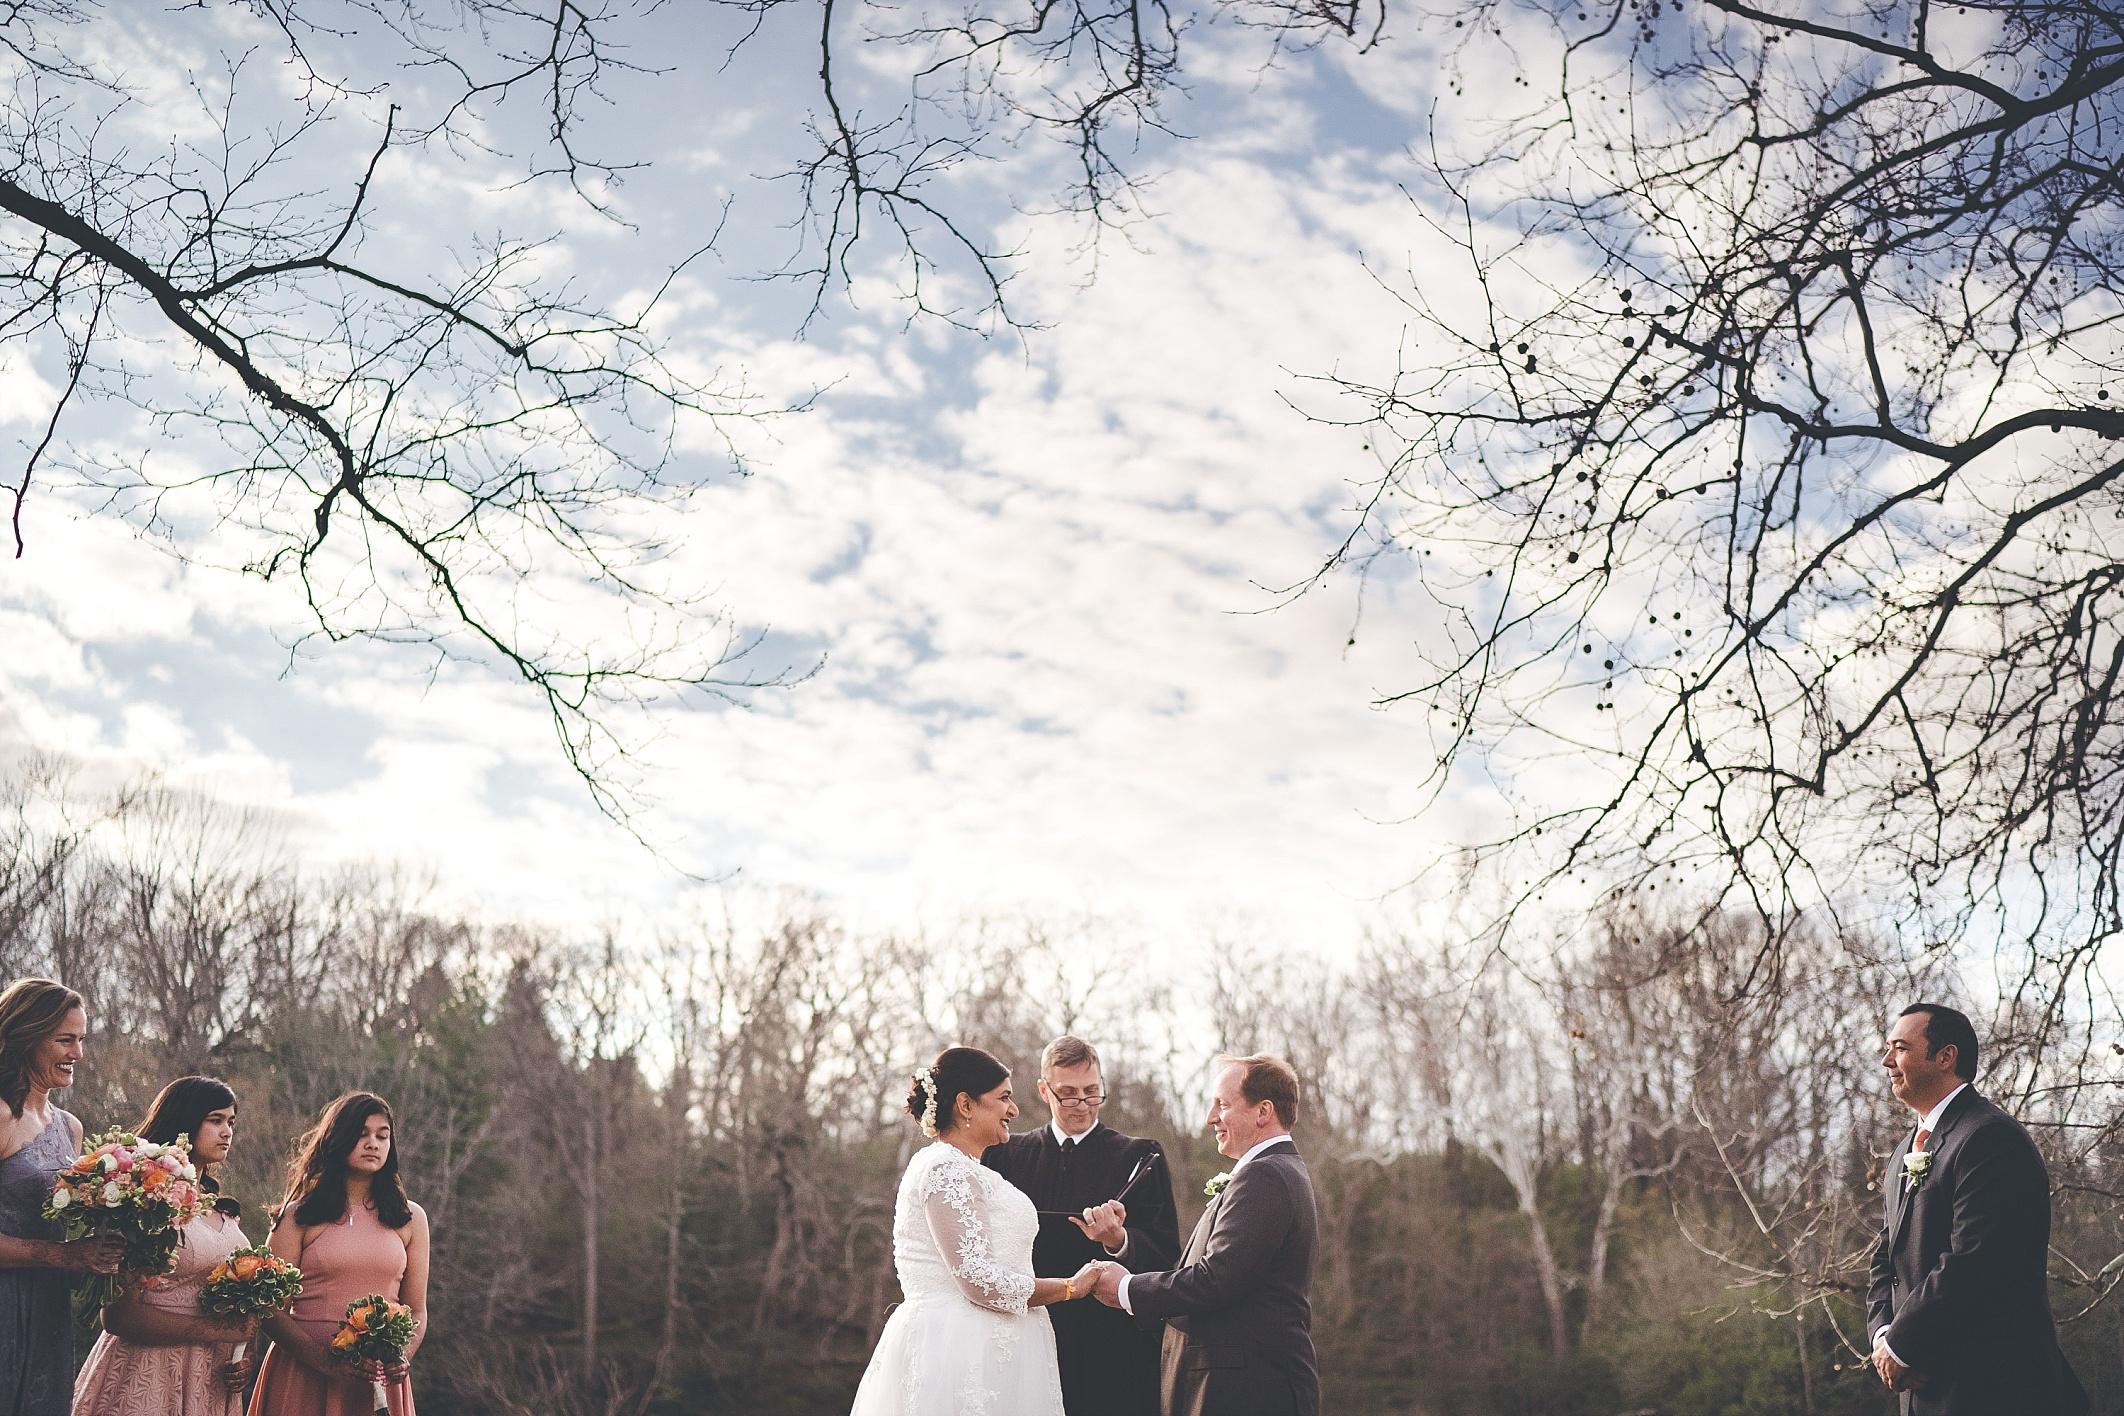 2709_dayton-indian-wedding-photographer-beavercreek_0064.jpg